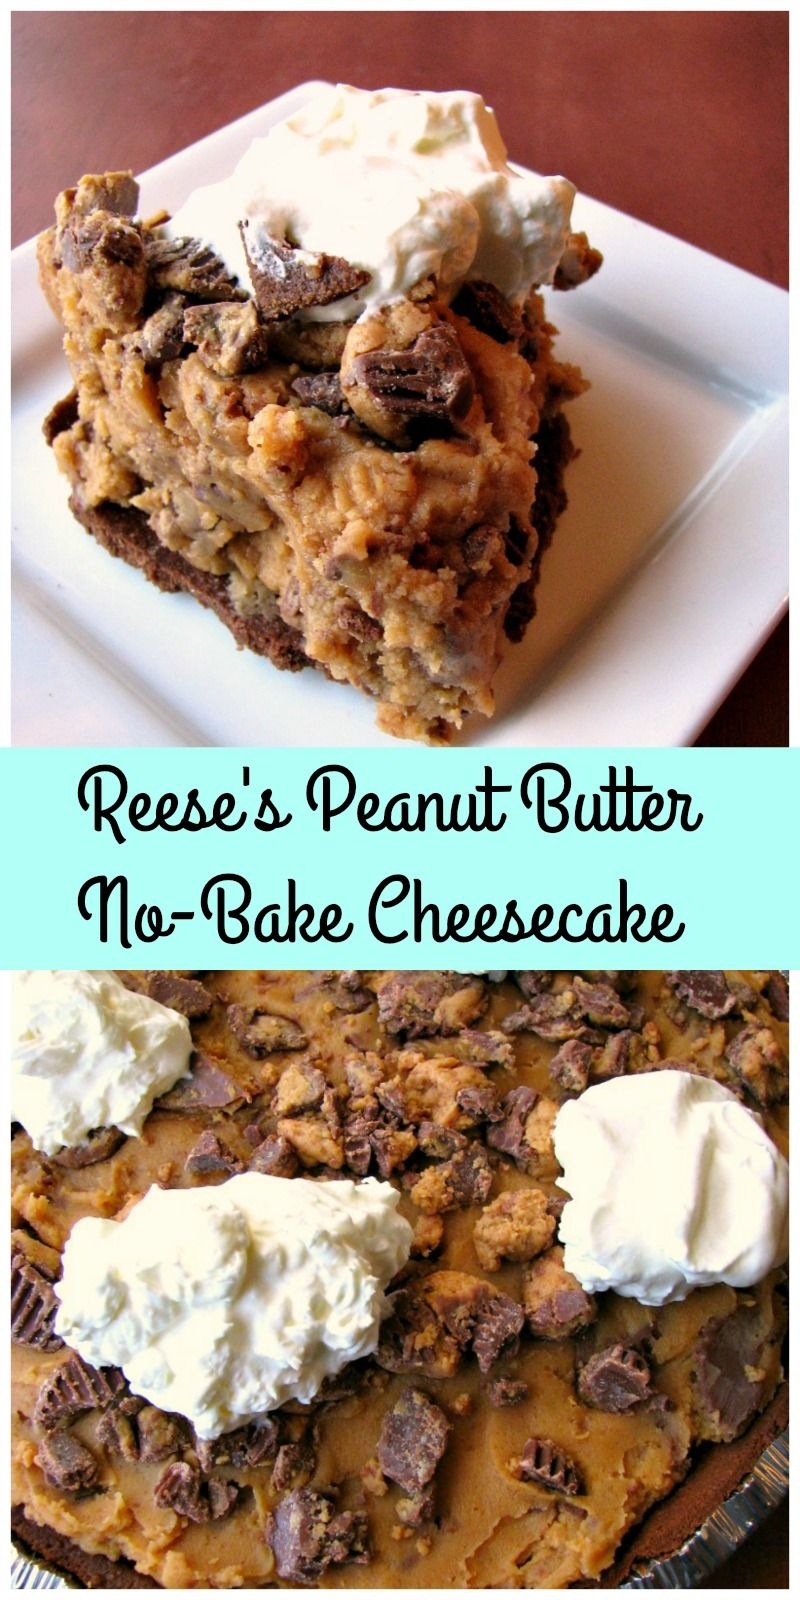 Reese\'s Peanut Butter No-Bake Cheesecake   Recipe   Peanut butter ...